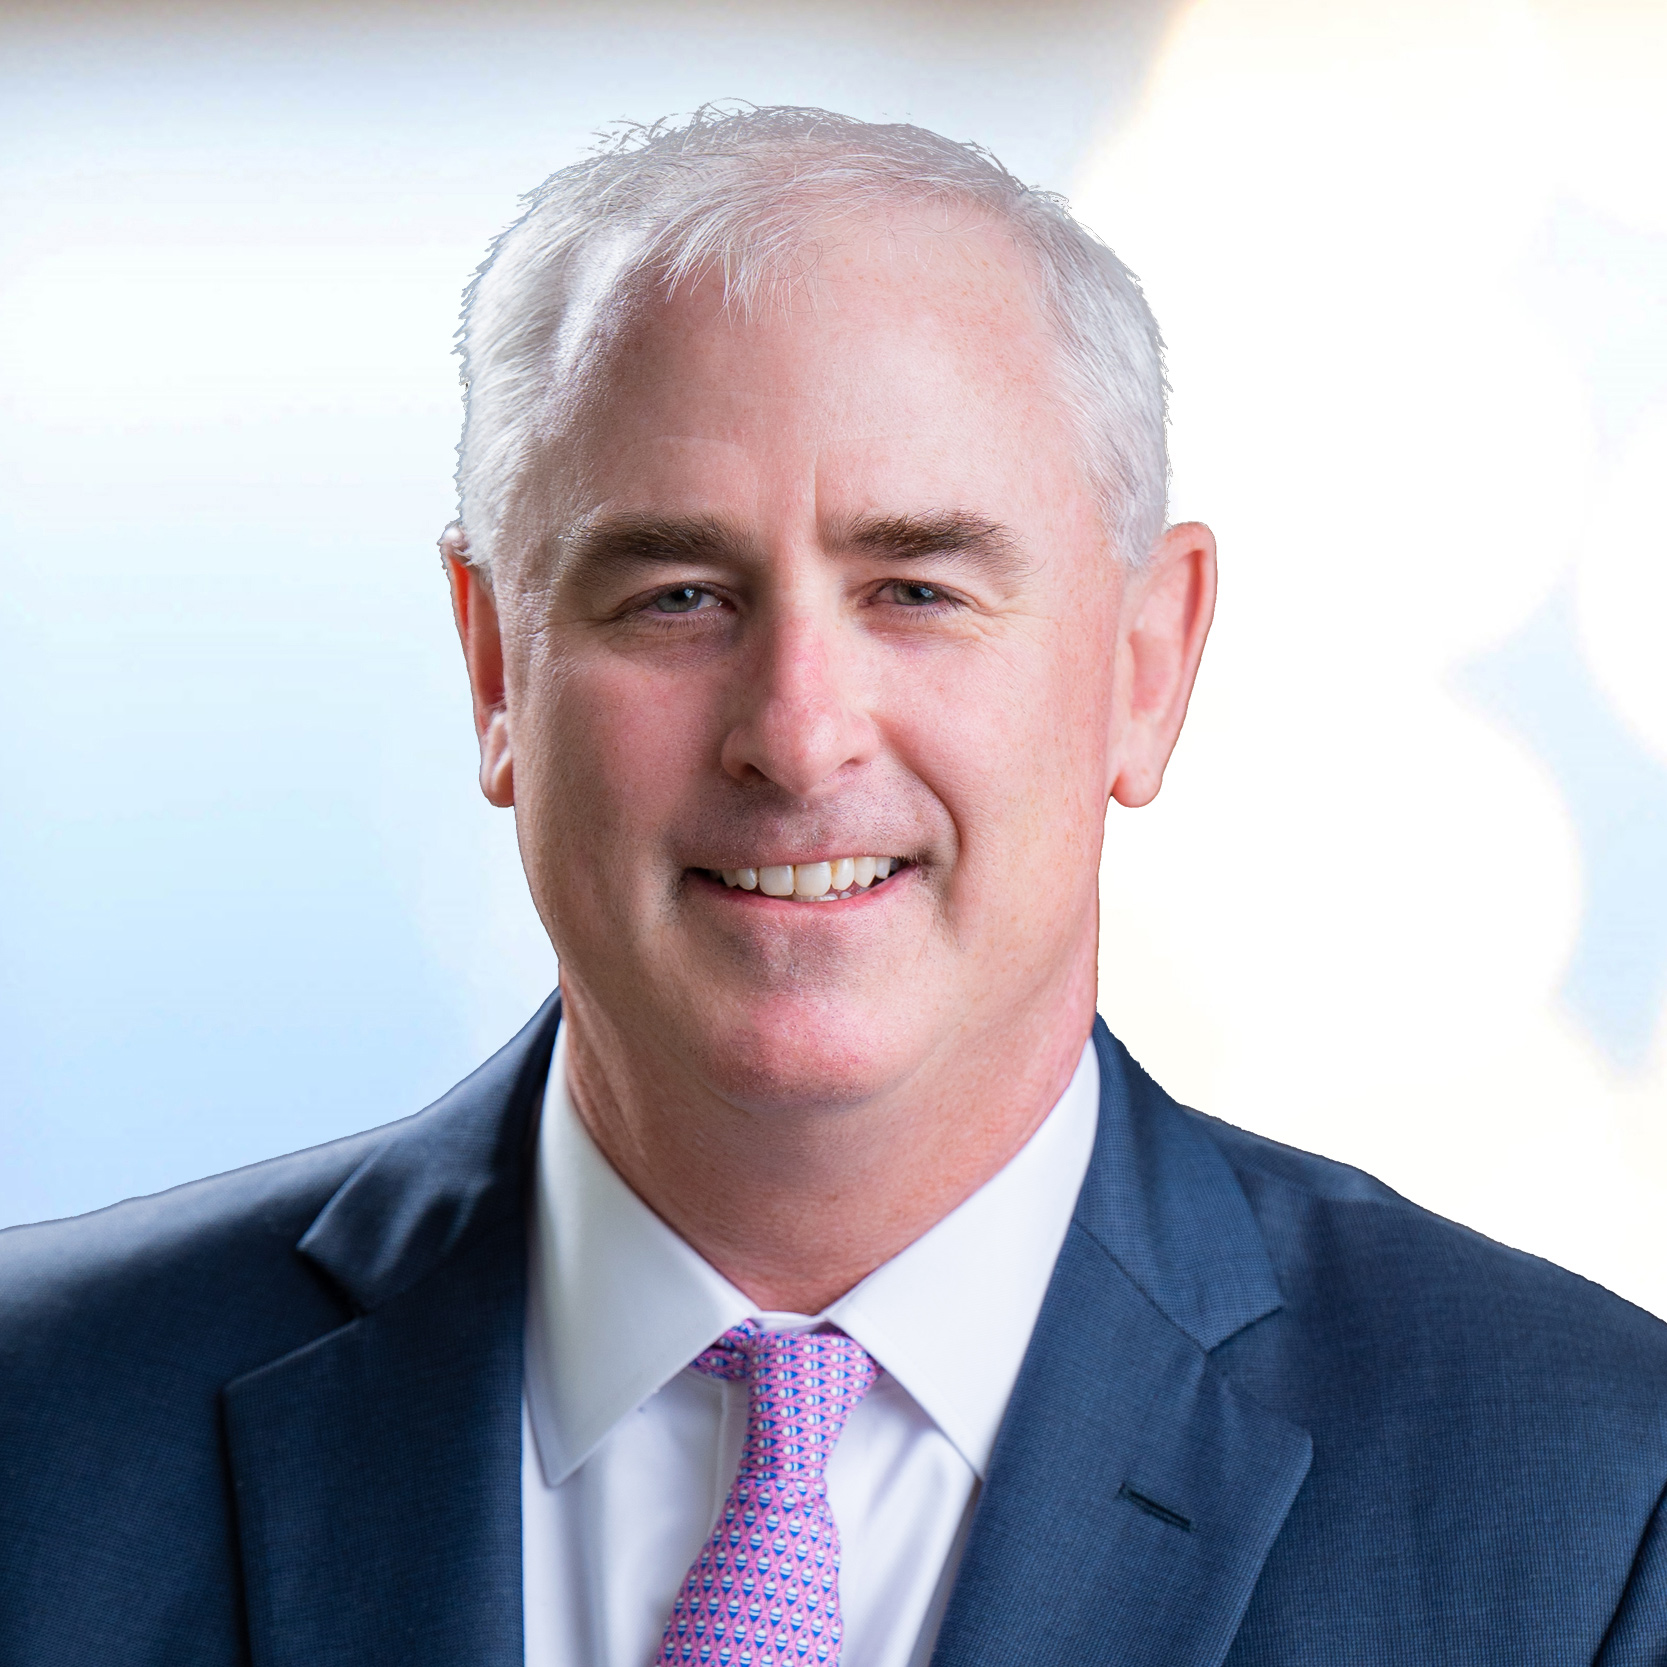 Kevin Lenhard estate planning attorney